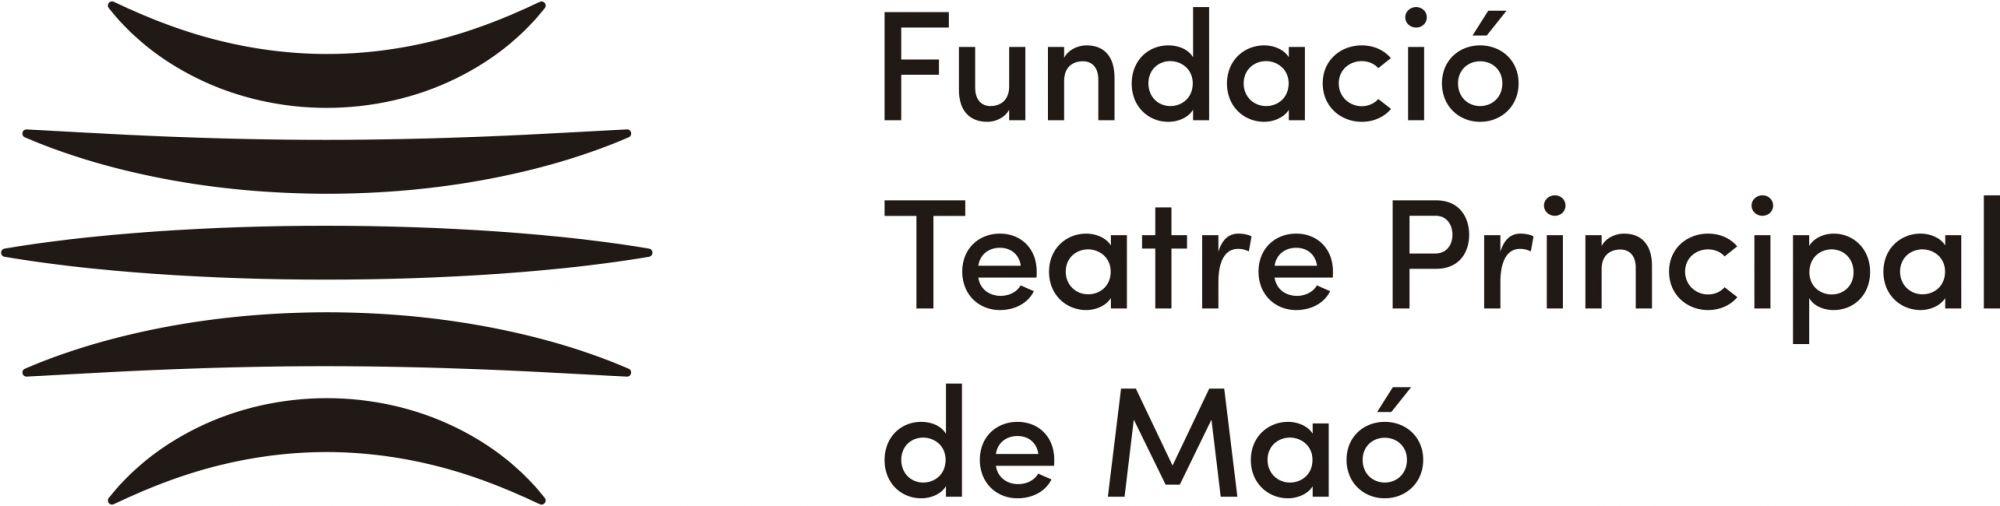 teatre-principal-mao-logotip-blanc-negre